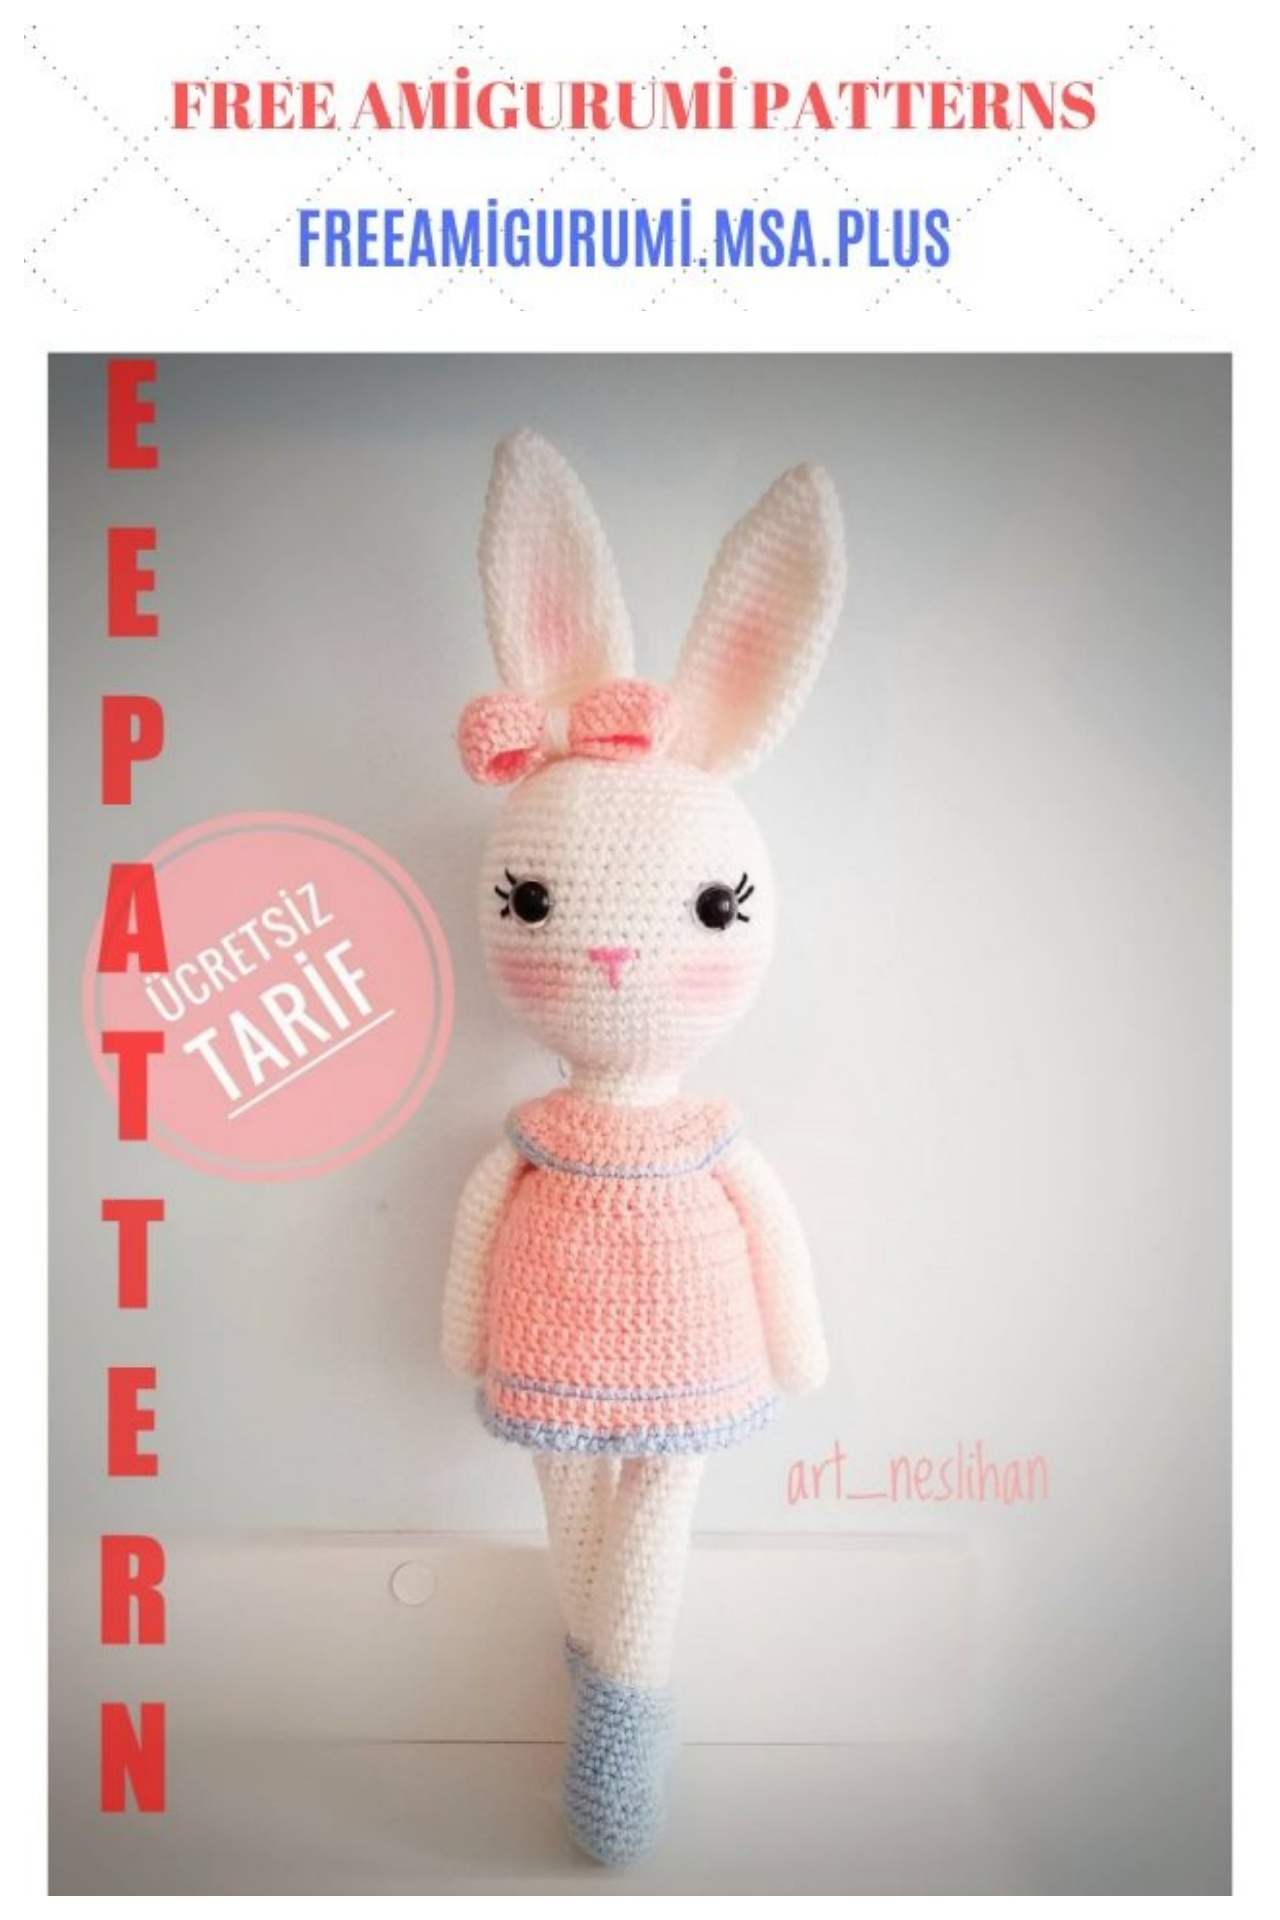 Free Crochet Bunny Pattern Kawaii Bunnies - Hooked On Patterns | 1920x1280